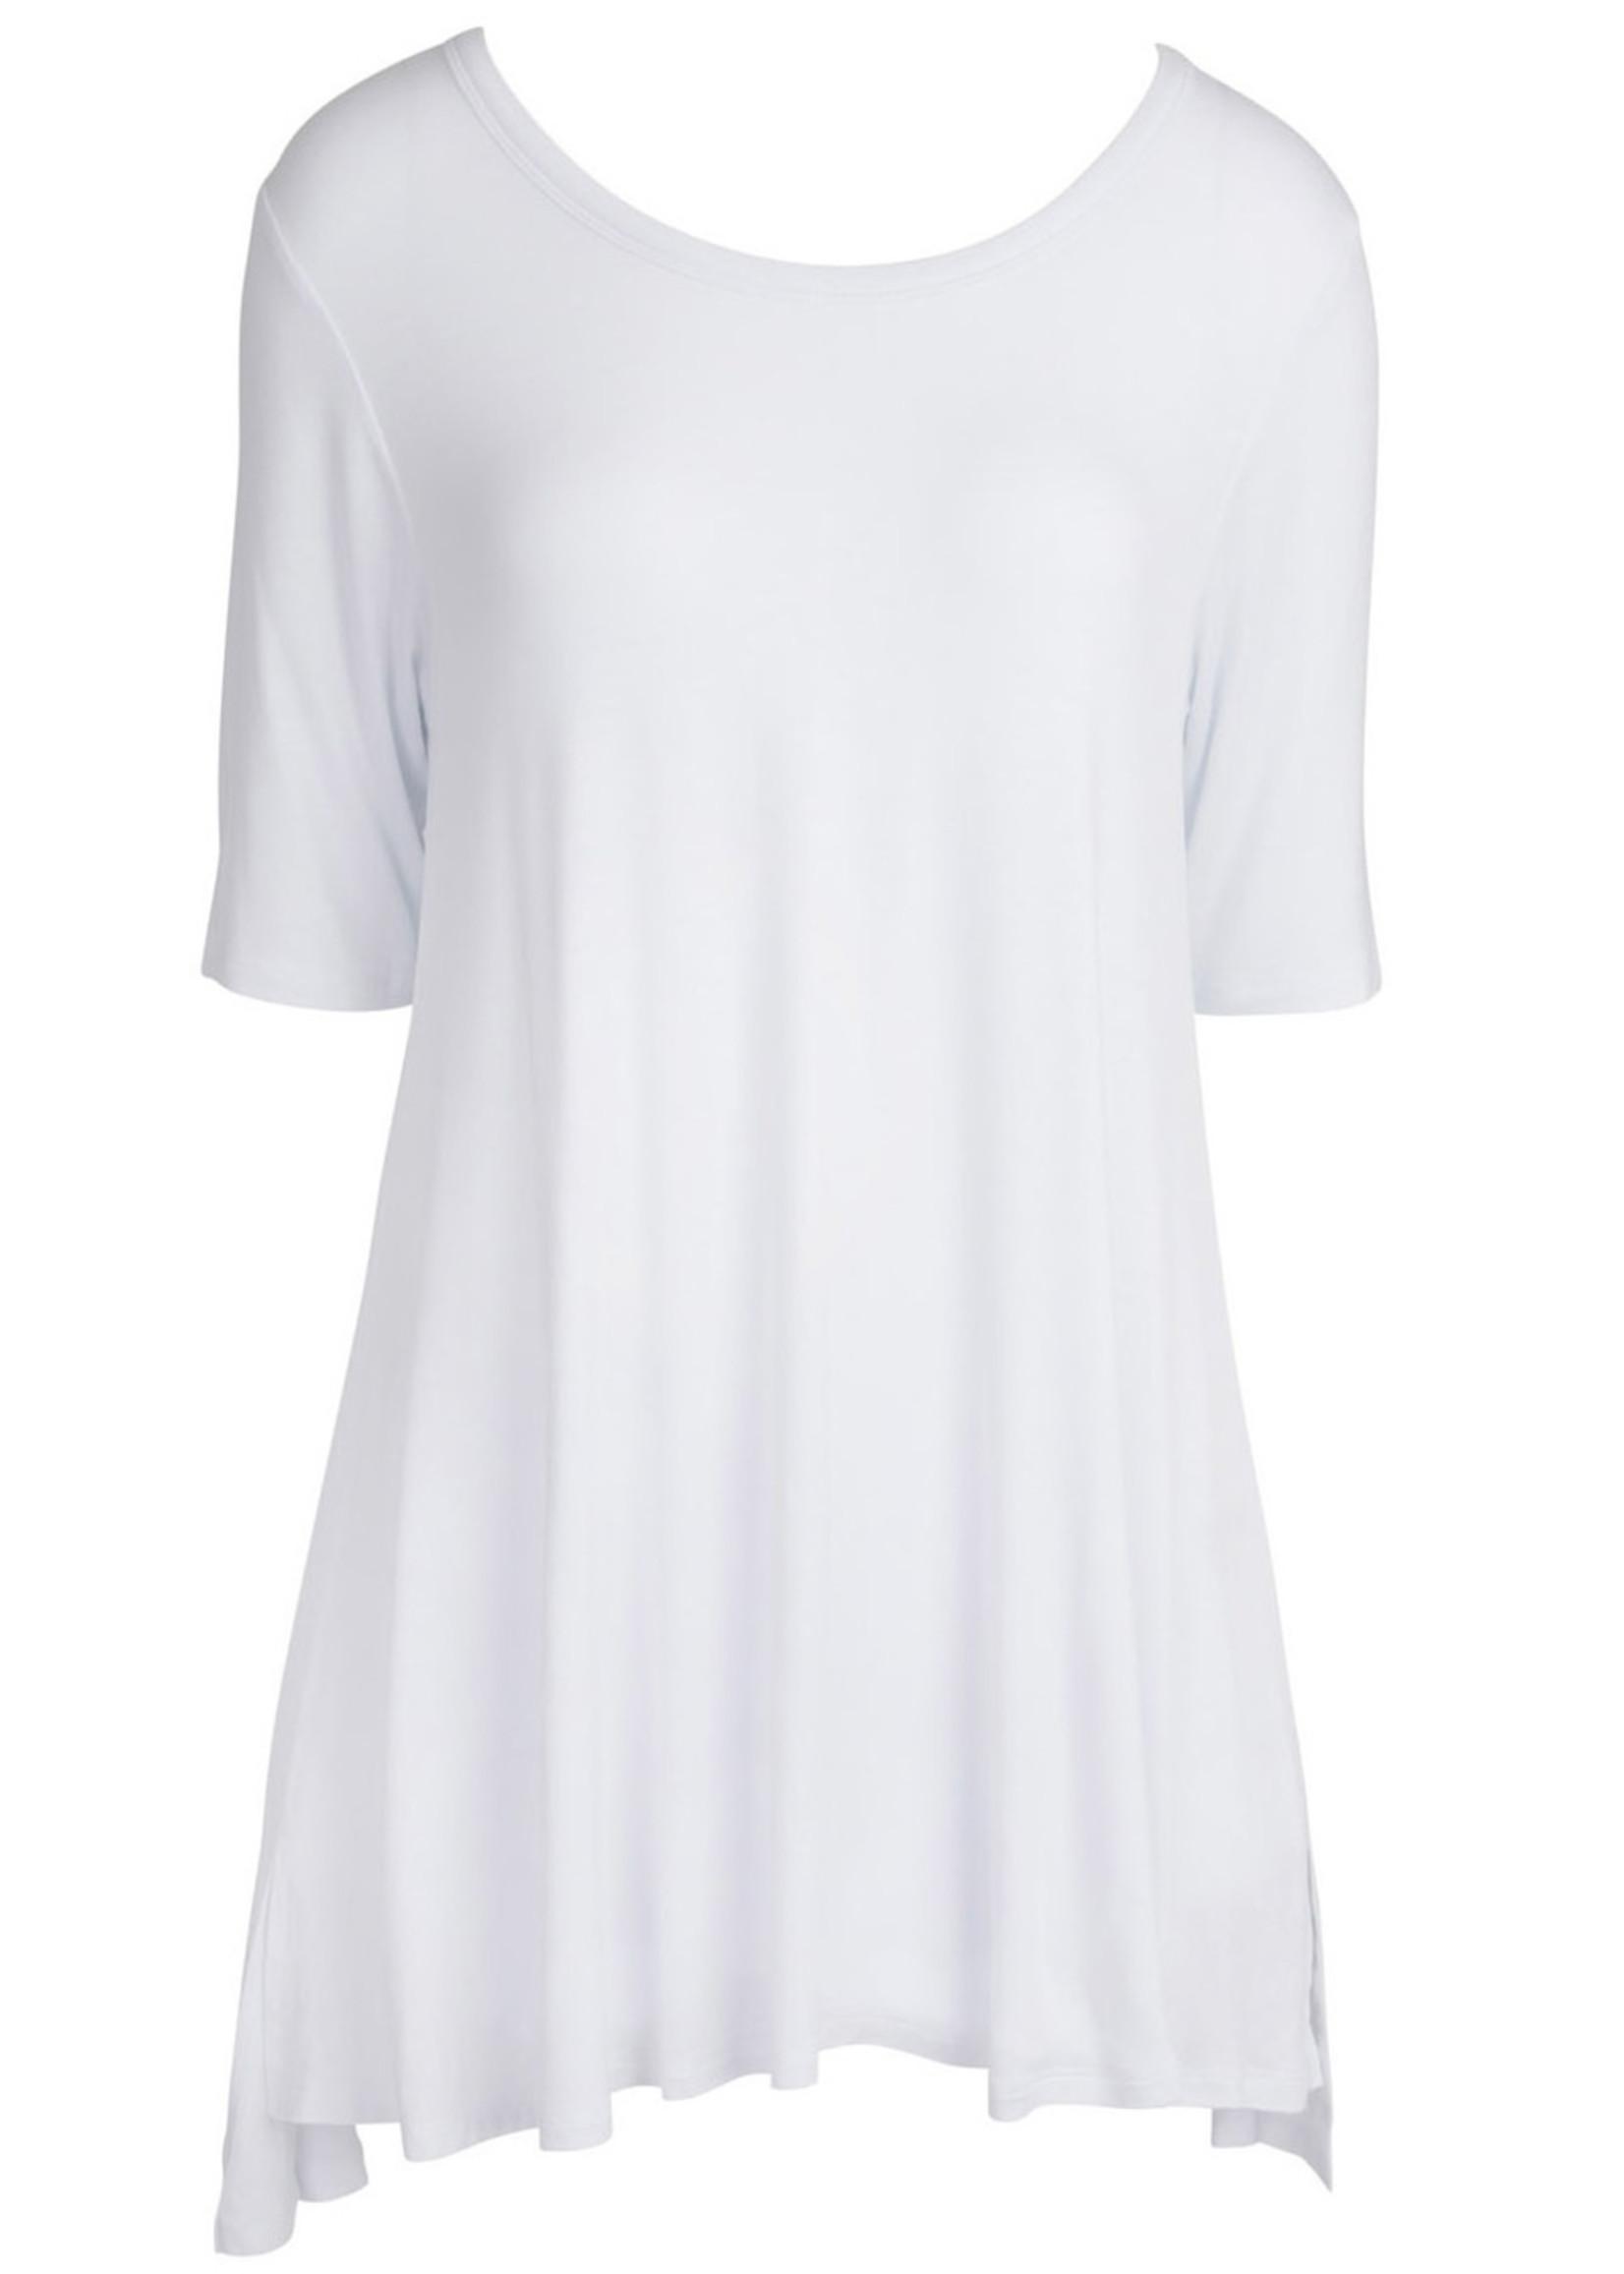 Swing Tunic - White LG/XL